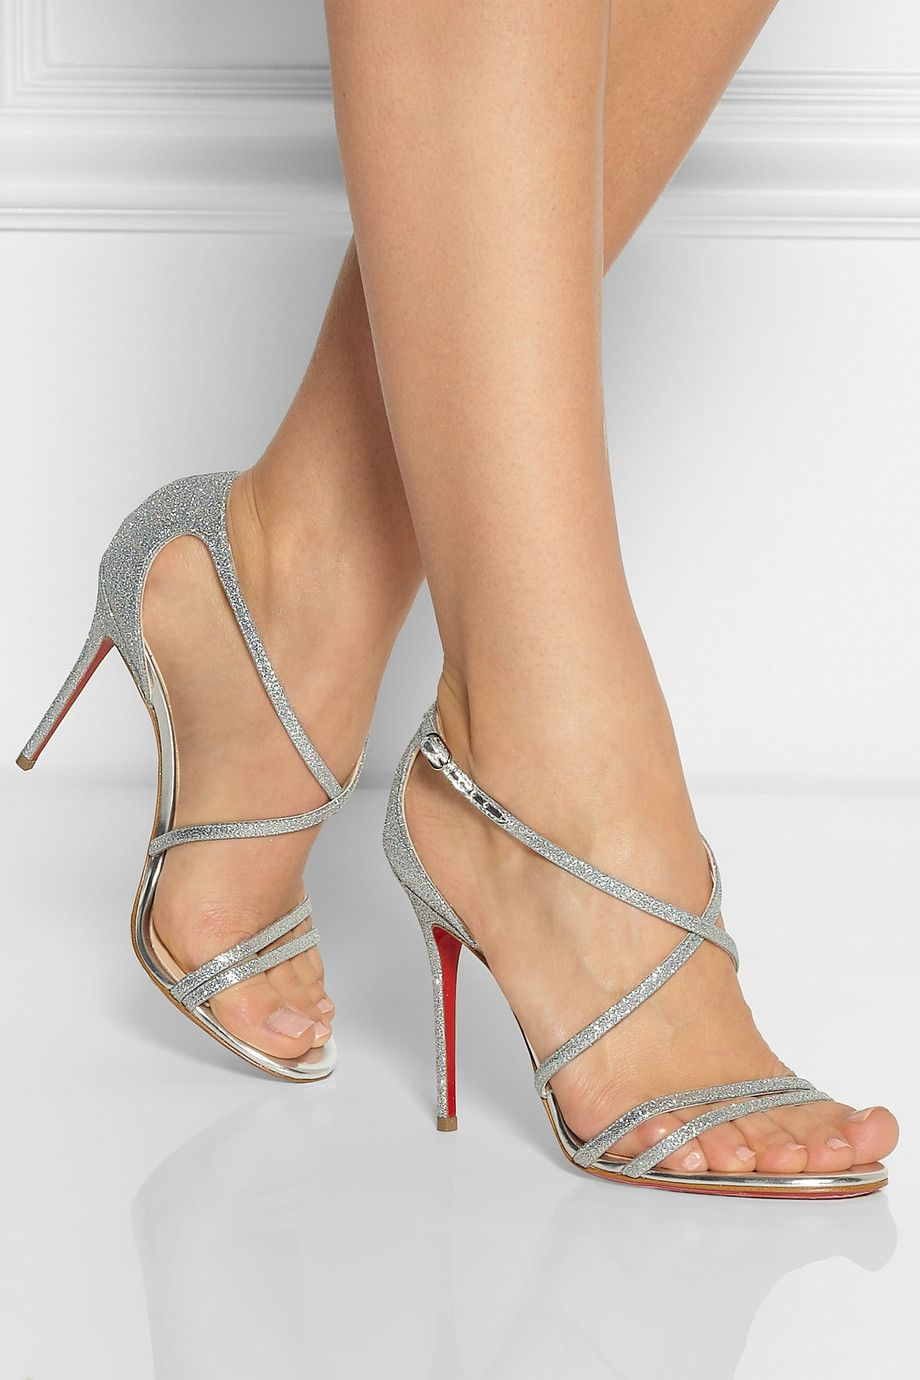 louboutin high heels sandals